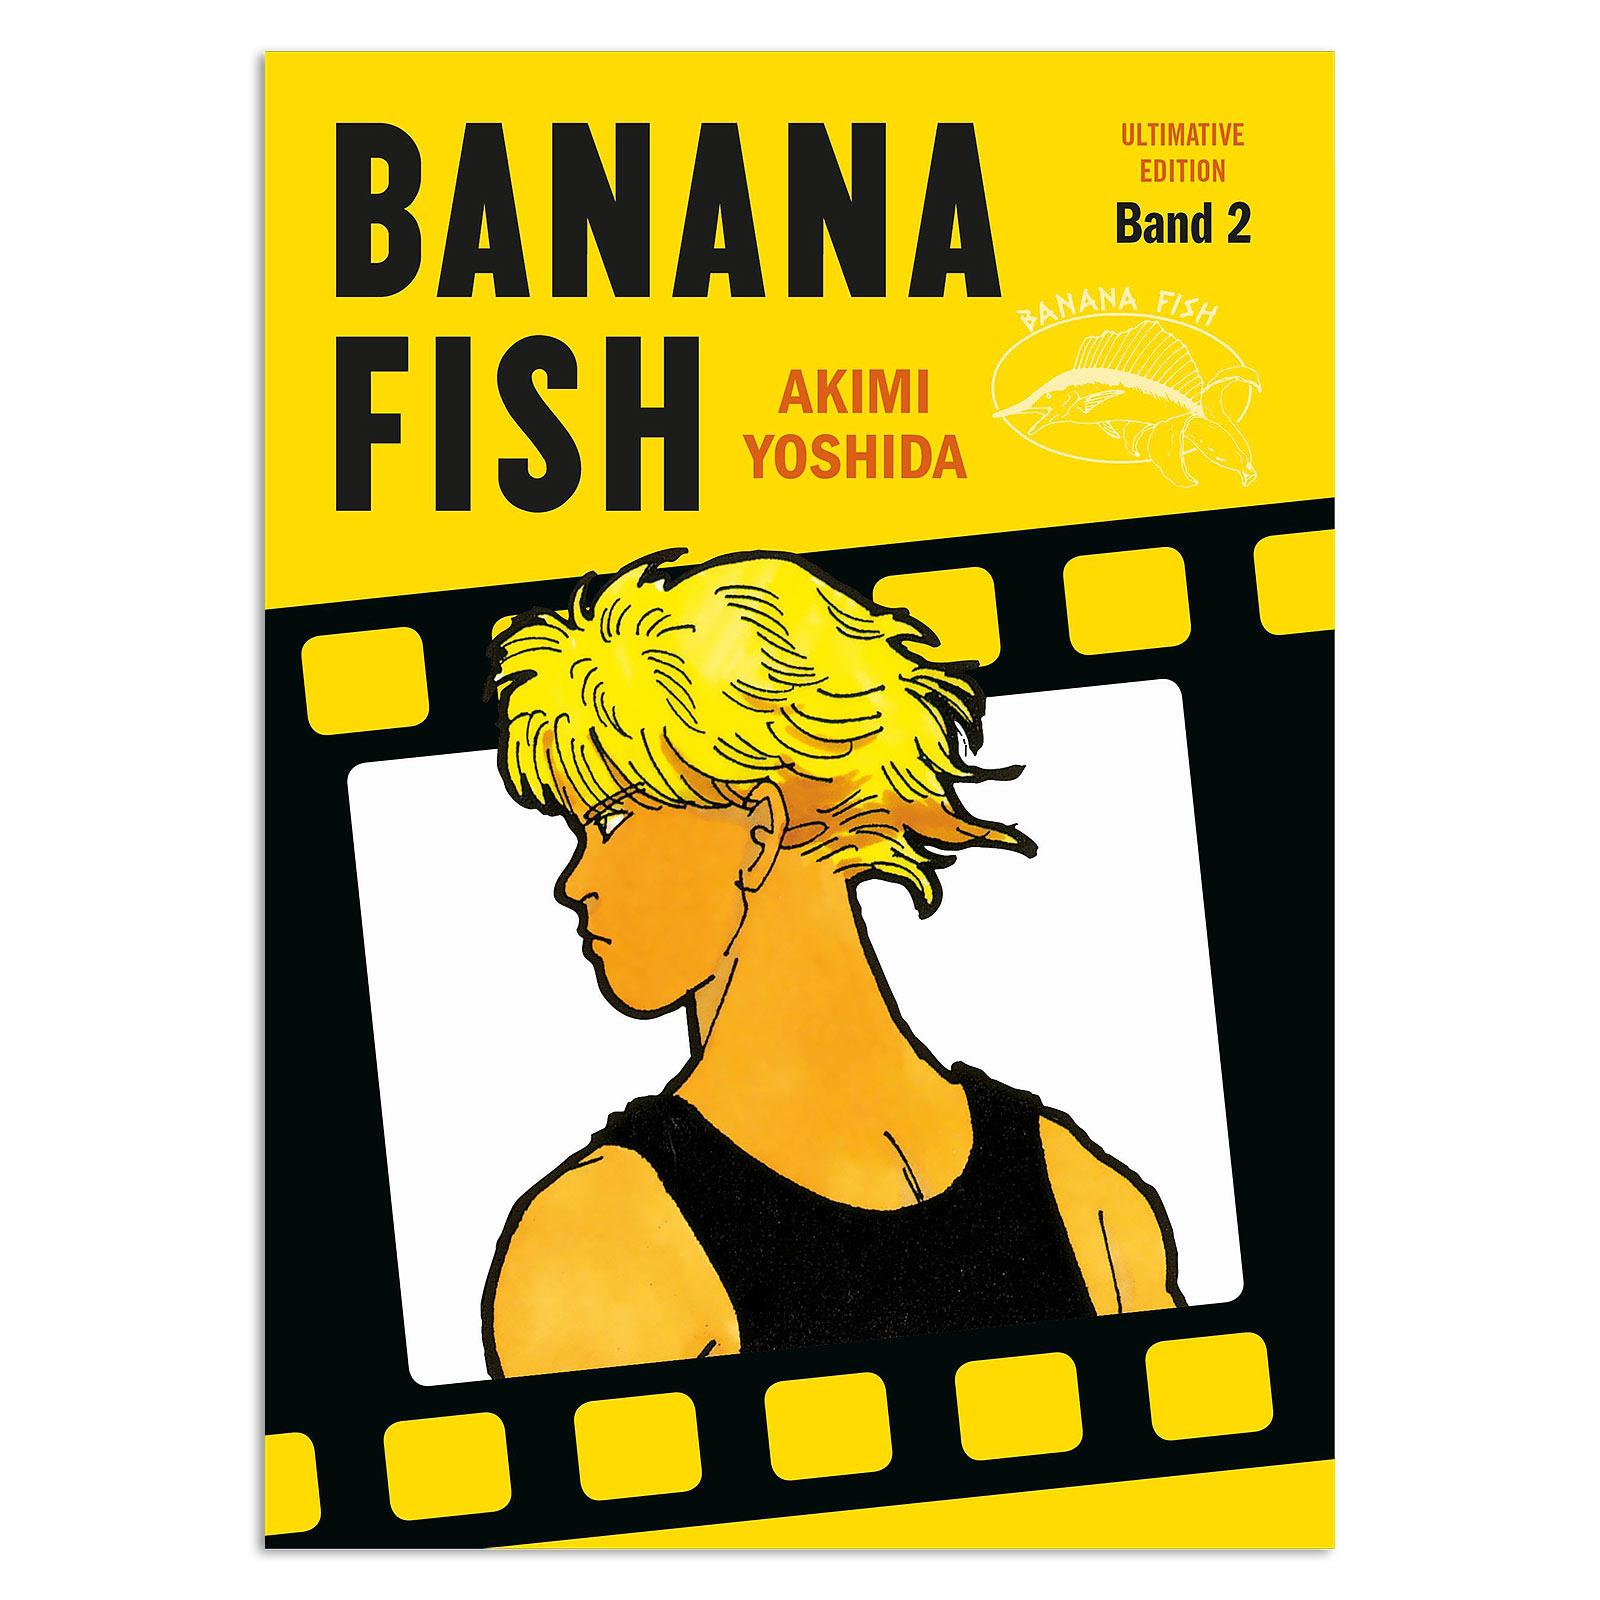 Banana Fish - Band 2 Taschenbuch Ultimate Edition